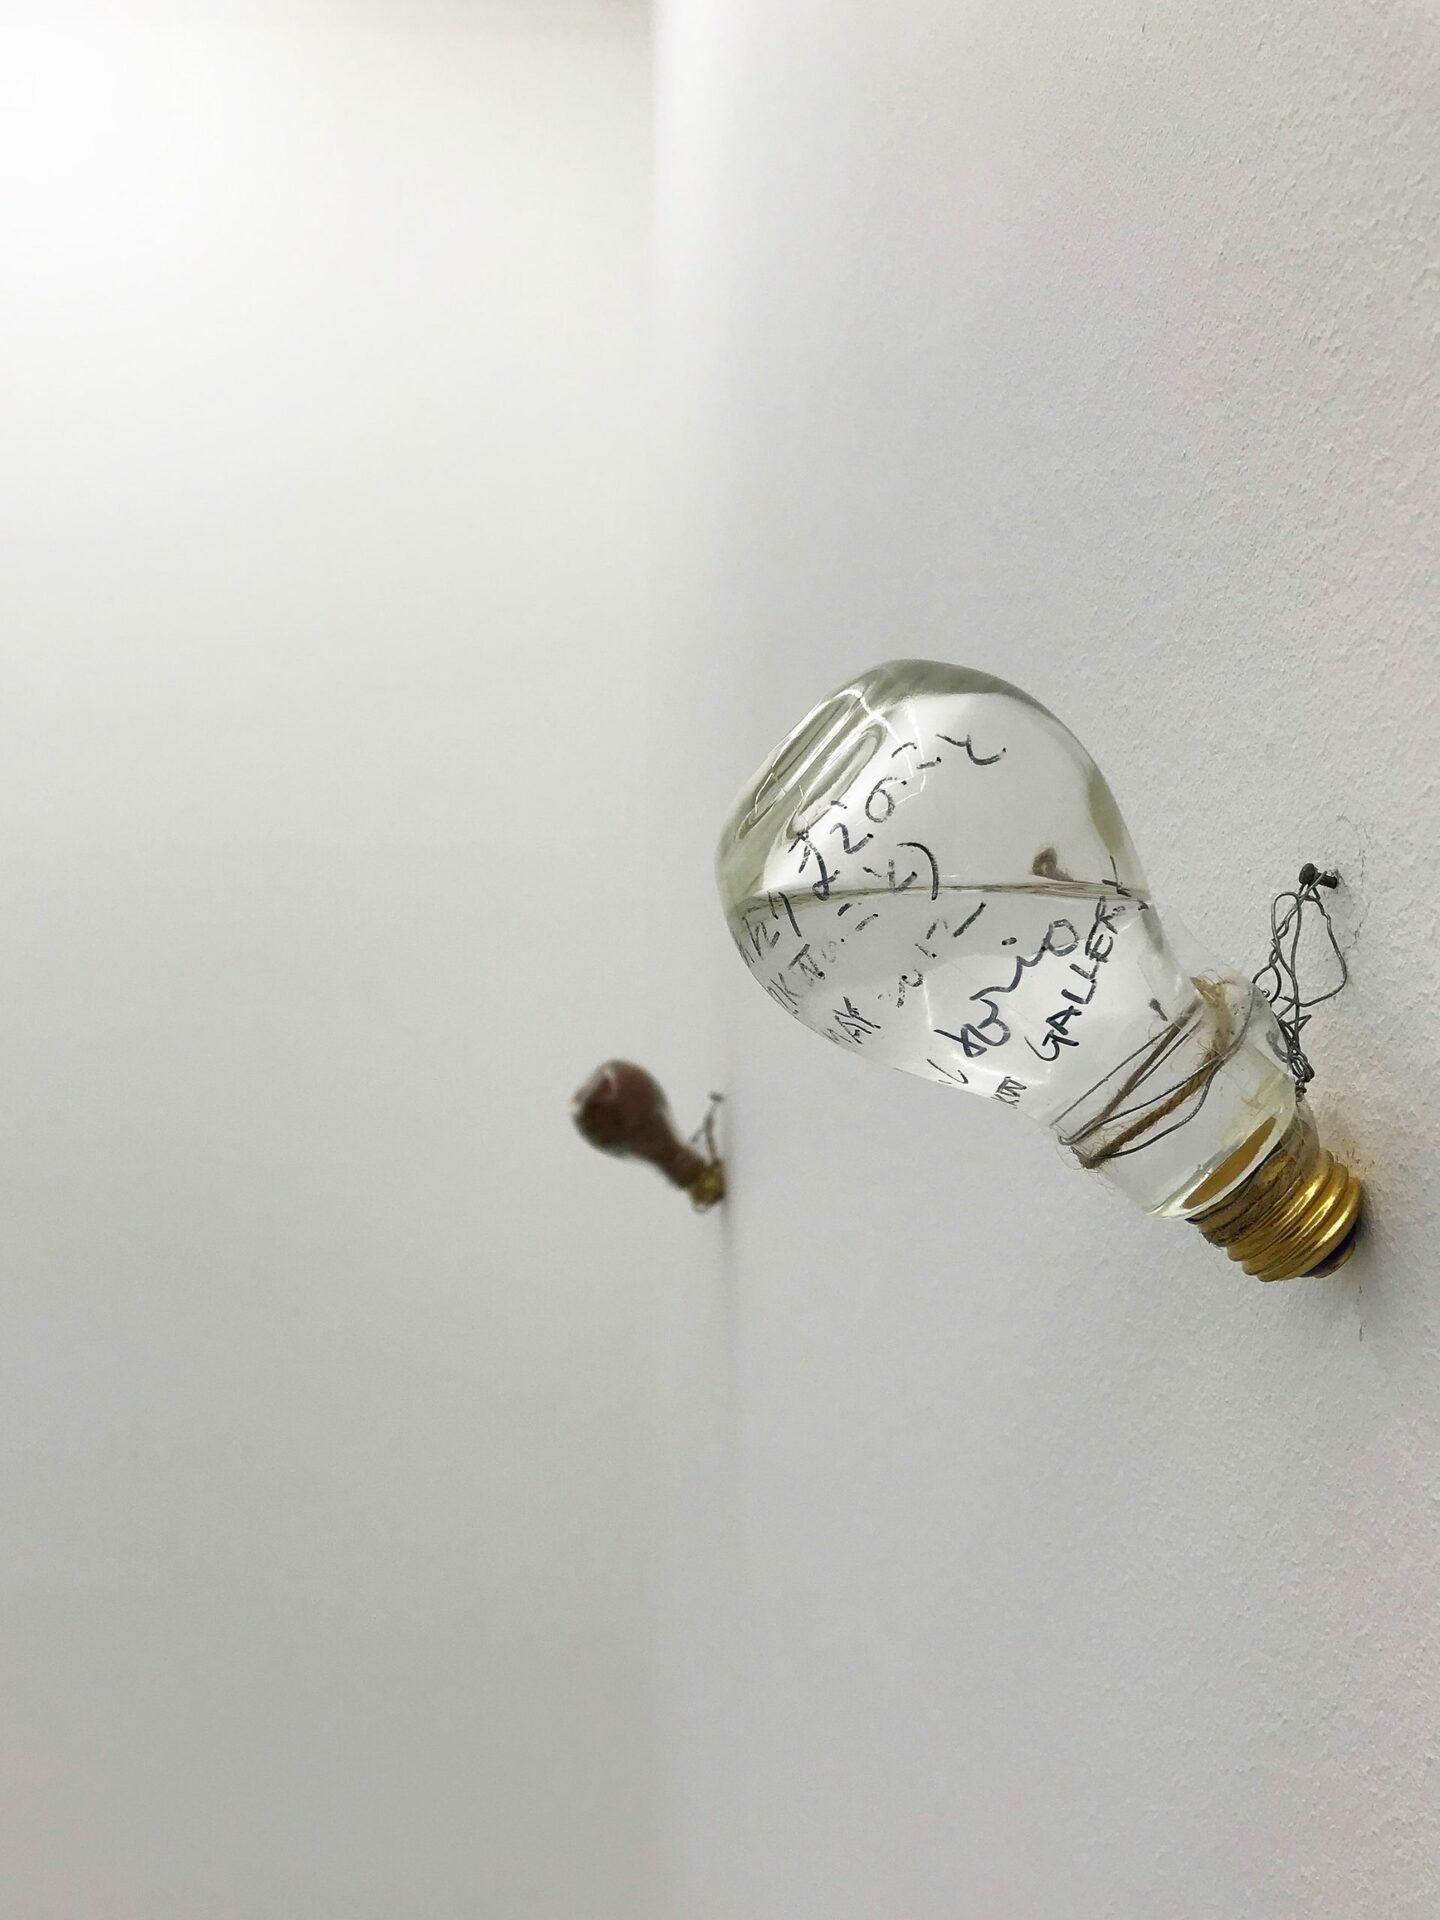 Sadaharu Horio, light bulb, basedonart gallery, Düsseldorf